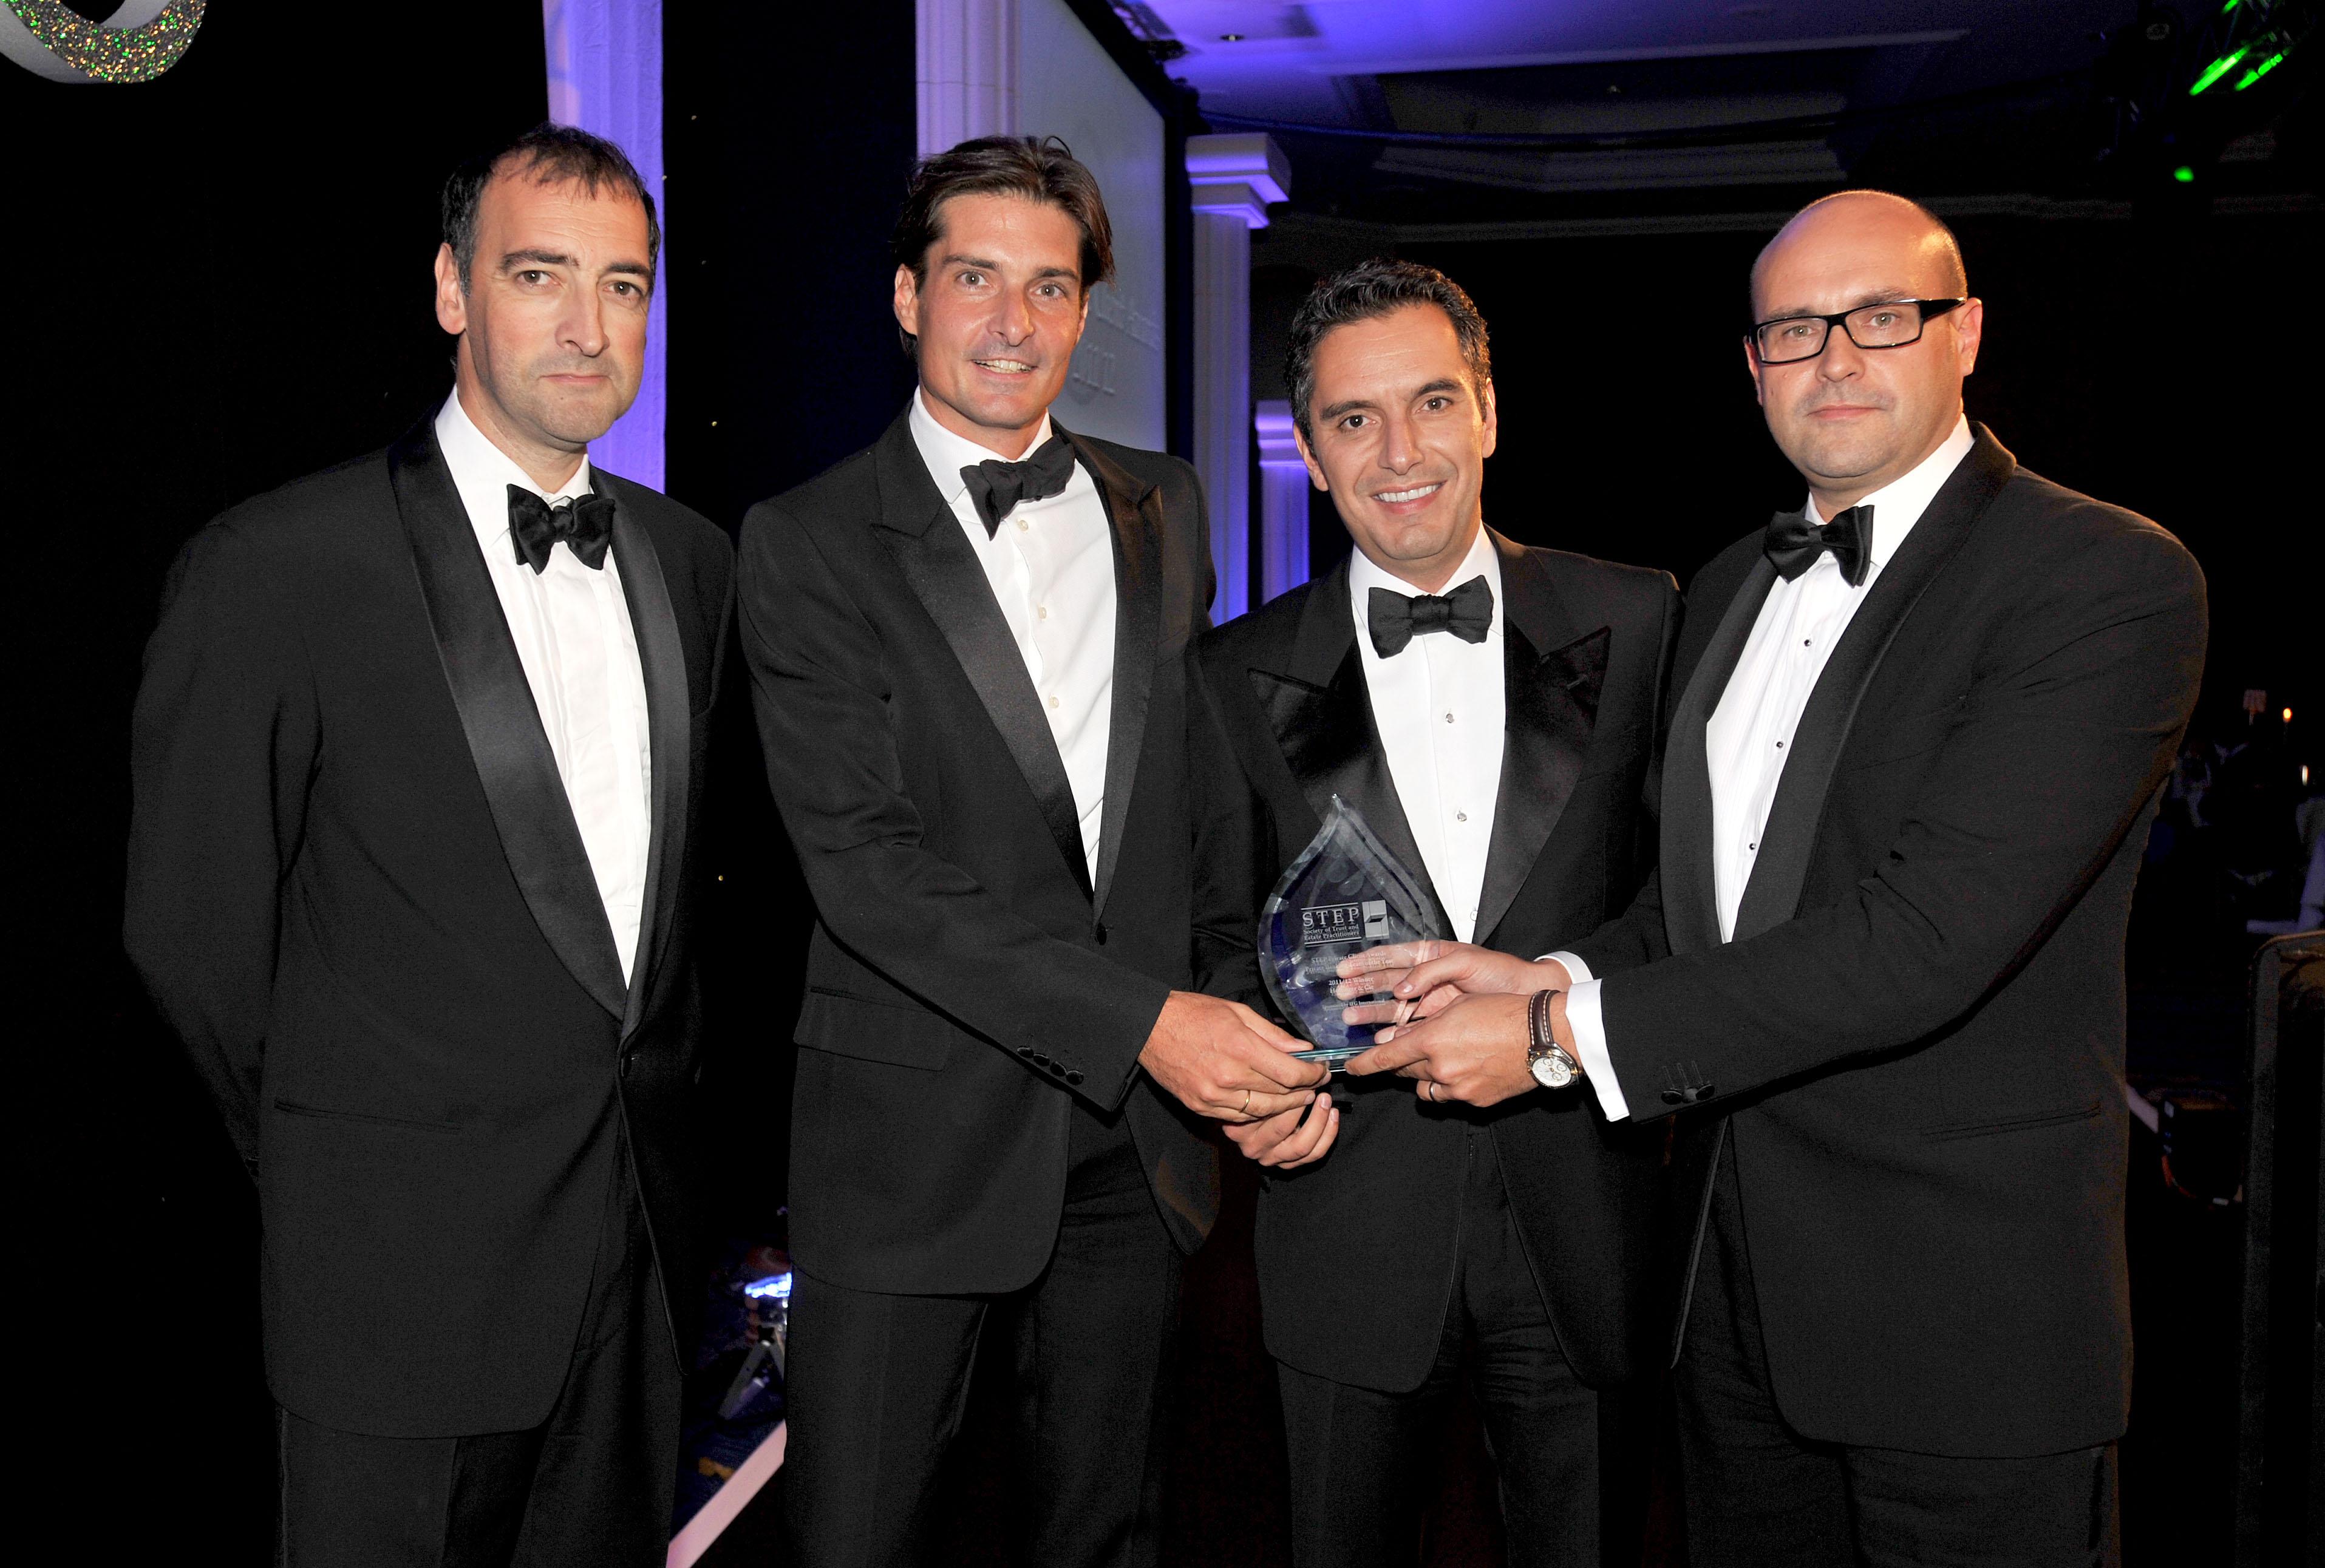 Corporate Awards Event